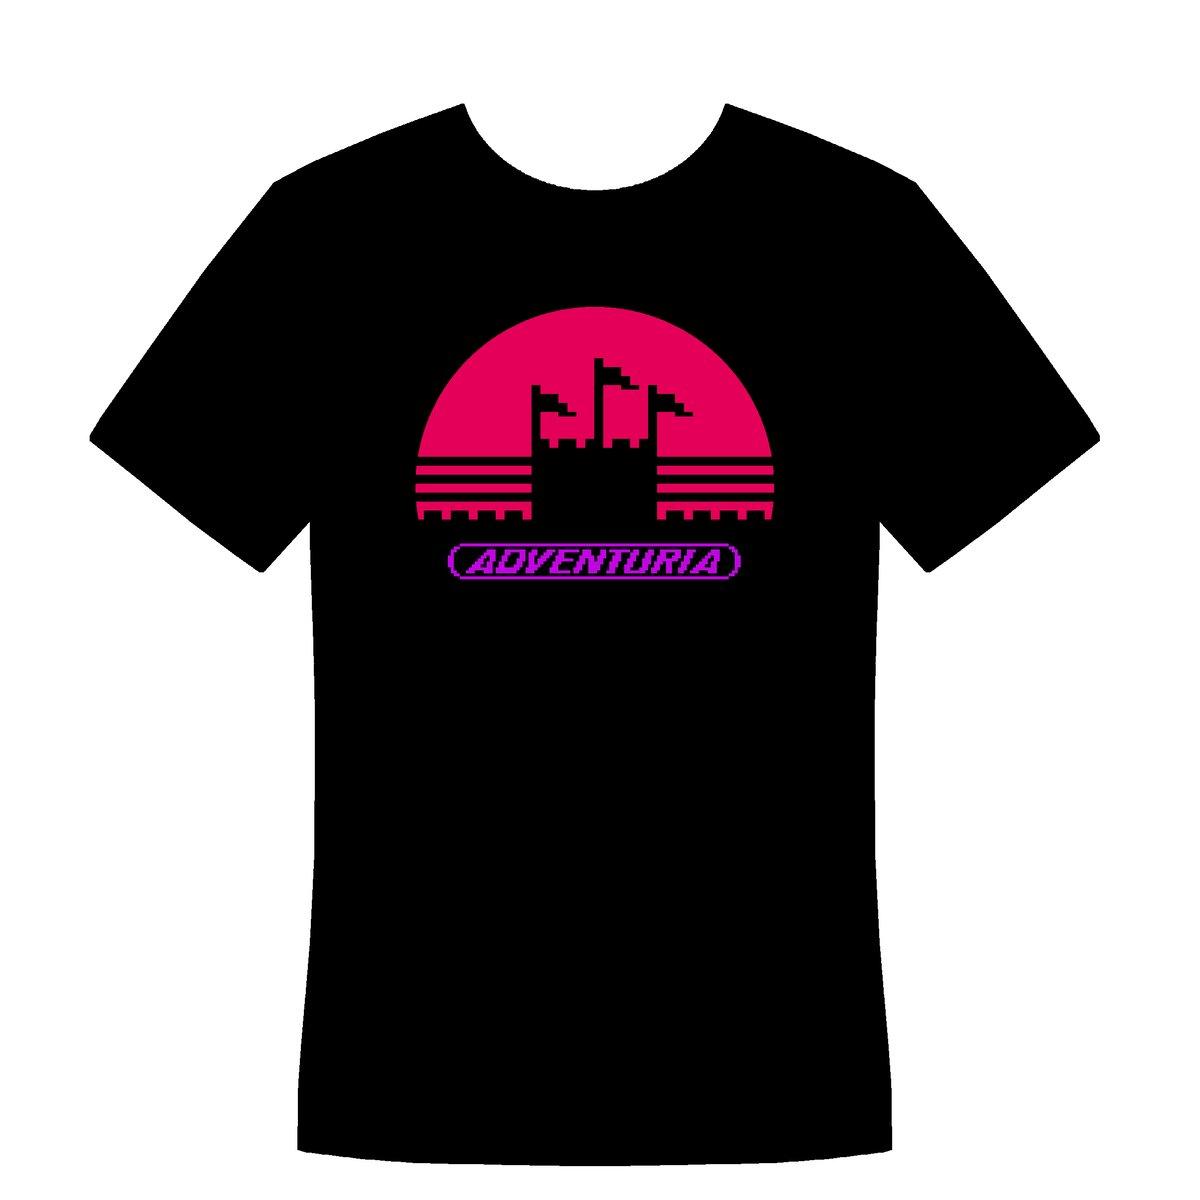 Image of Adventuria T-shirt